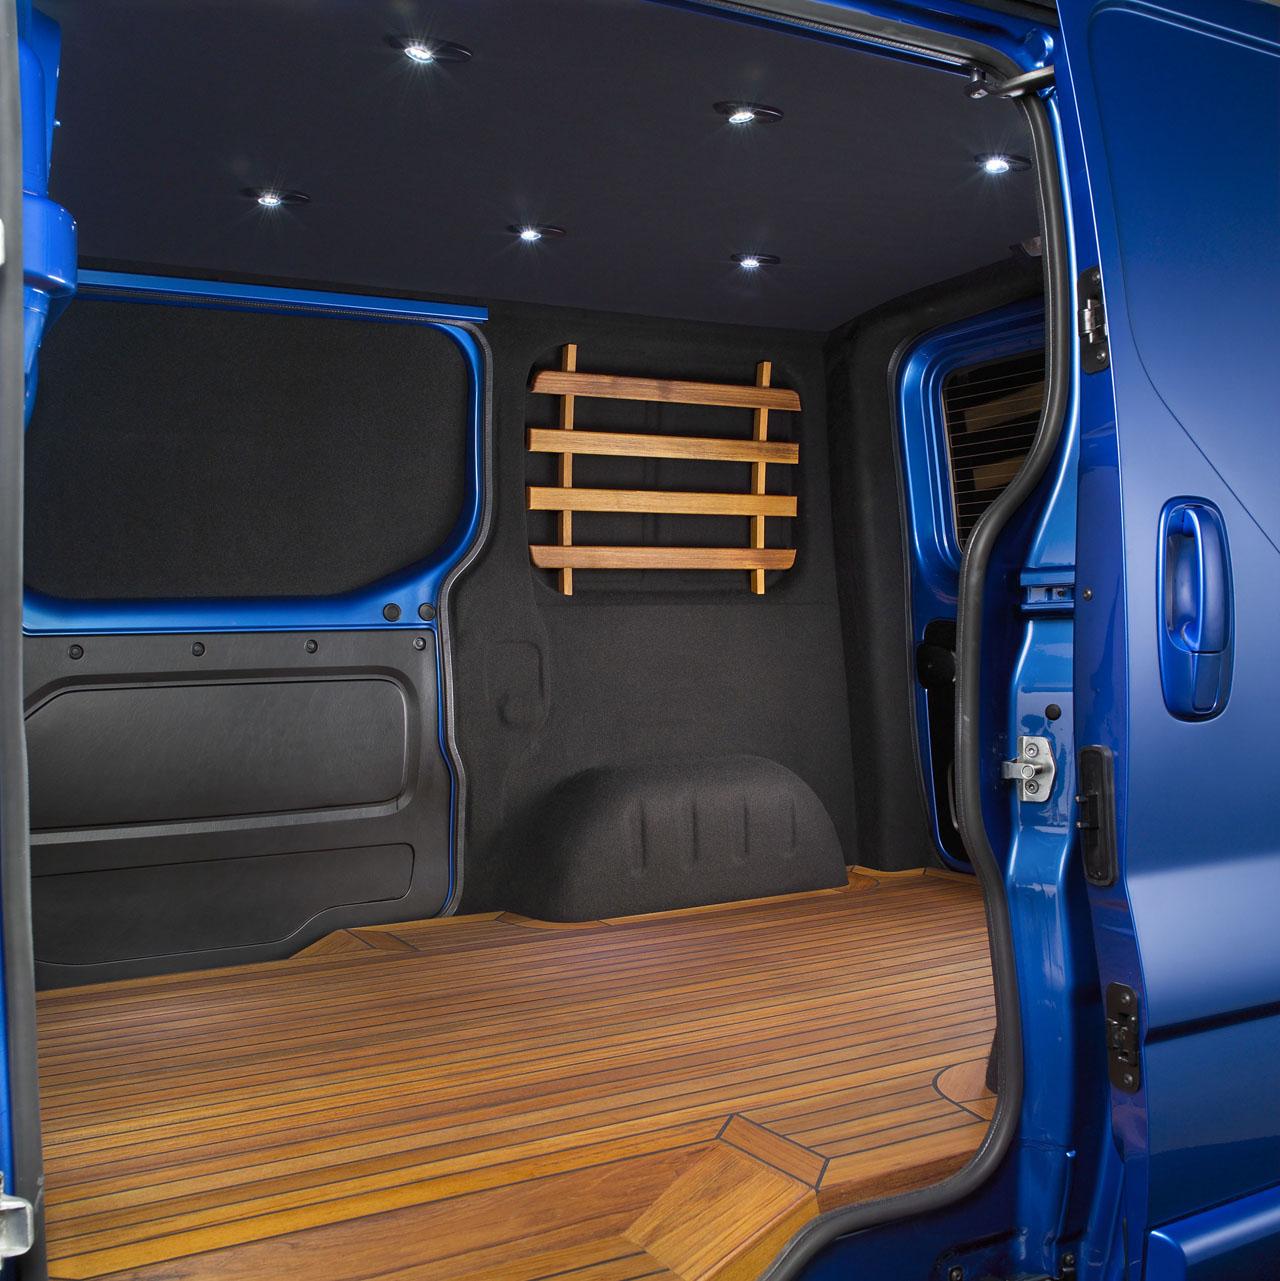 opel vivaro 1280x1281 6 tapety na pulpit samochody sportowe luksusowe supersamochody. Black Bedroom Furniture Sets. Home Design Ideas